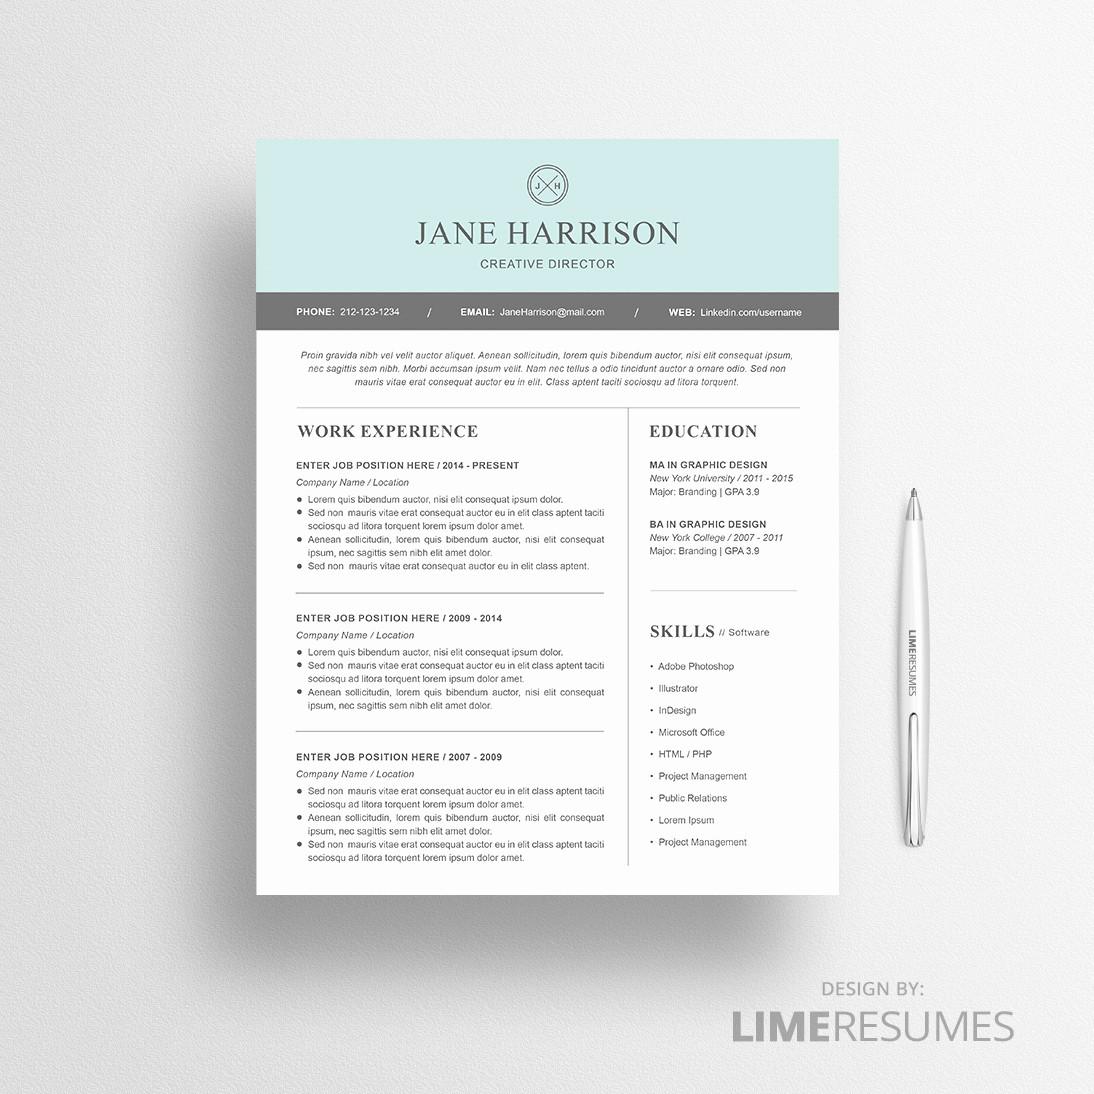 Best Resume Template Microsoft Word Fresh Modern Resume Template for Microsoft Word Limeresumes